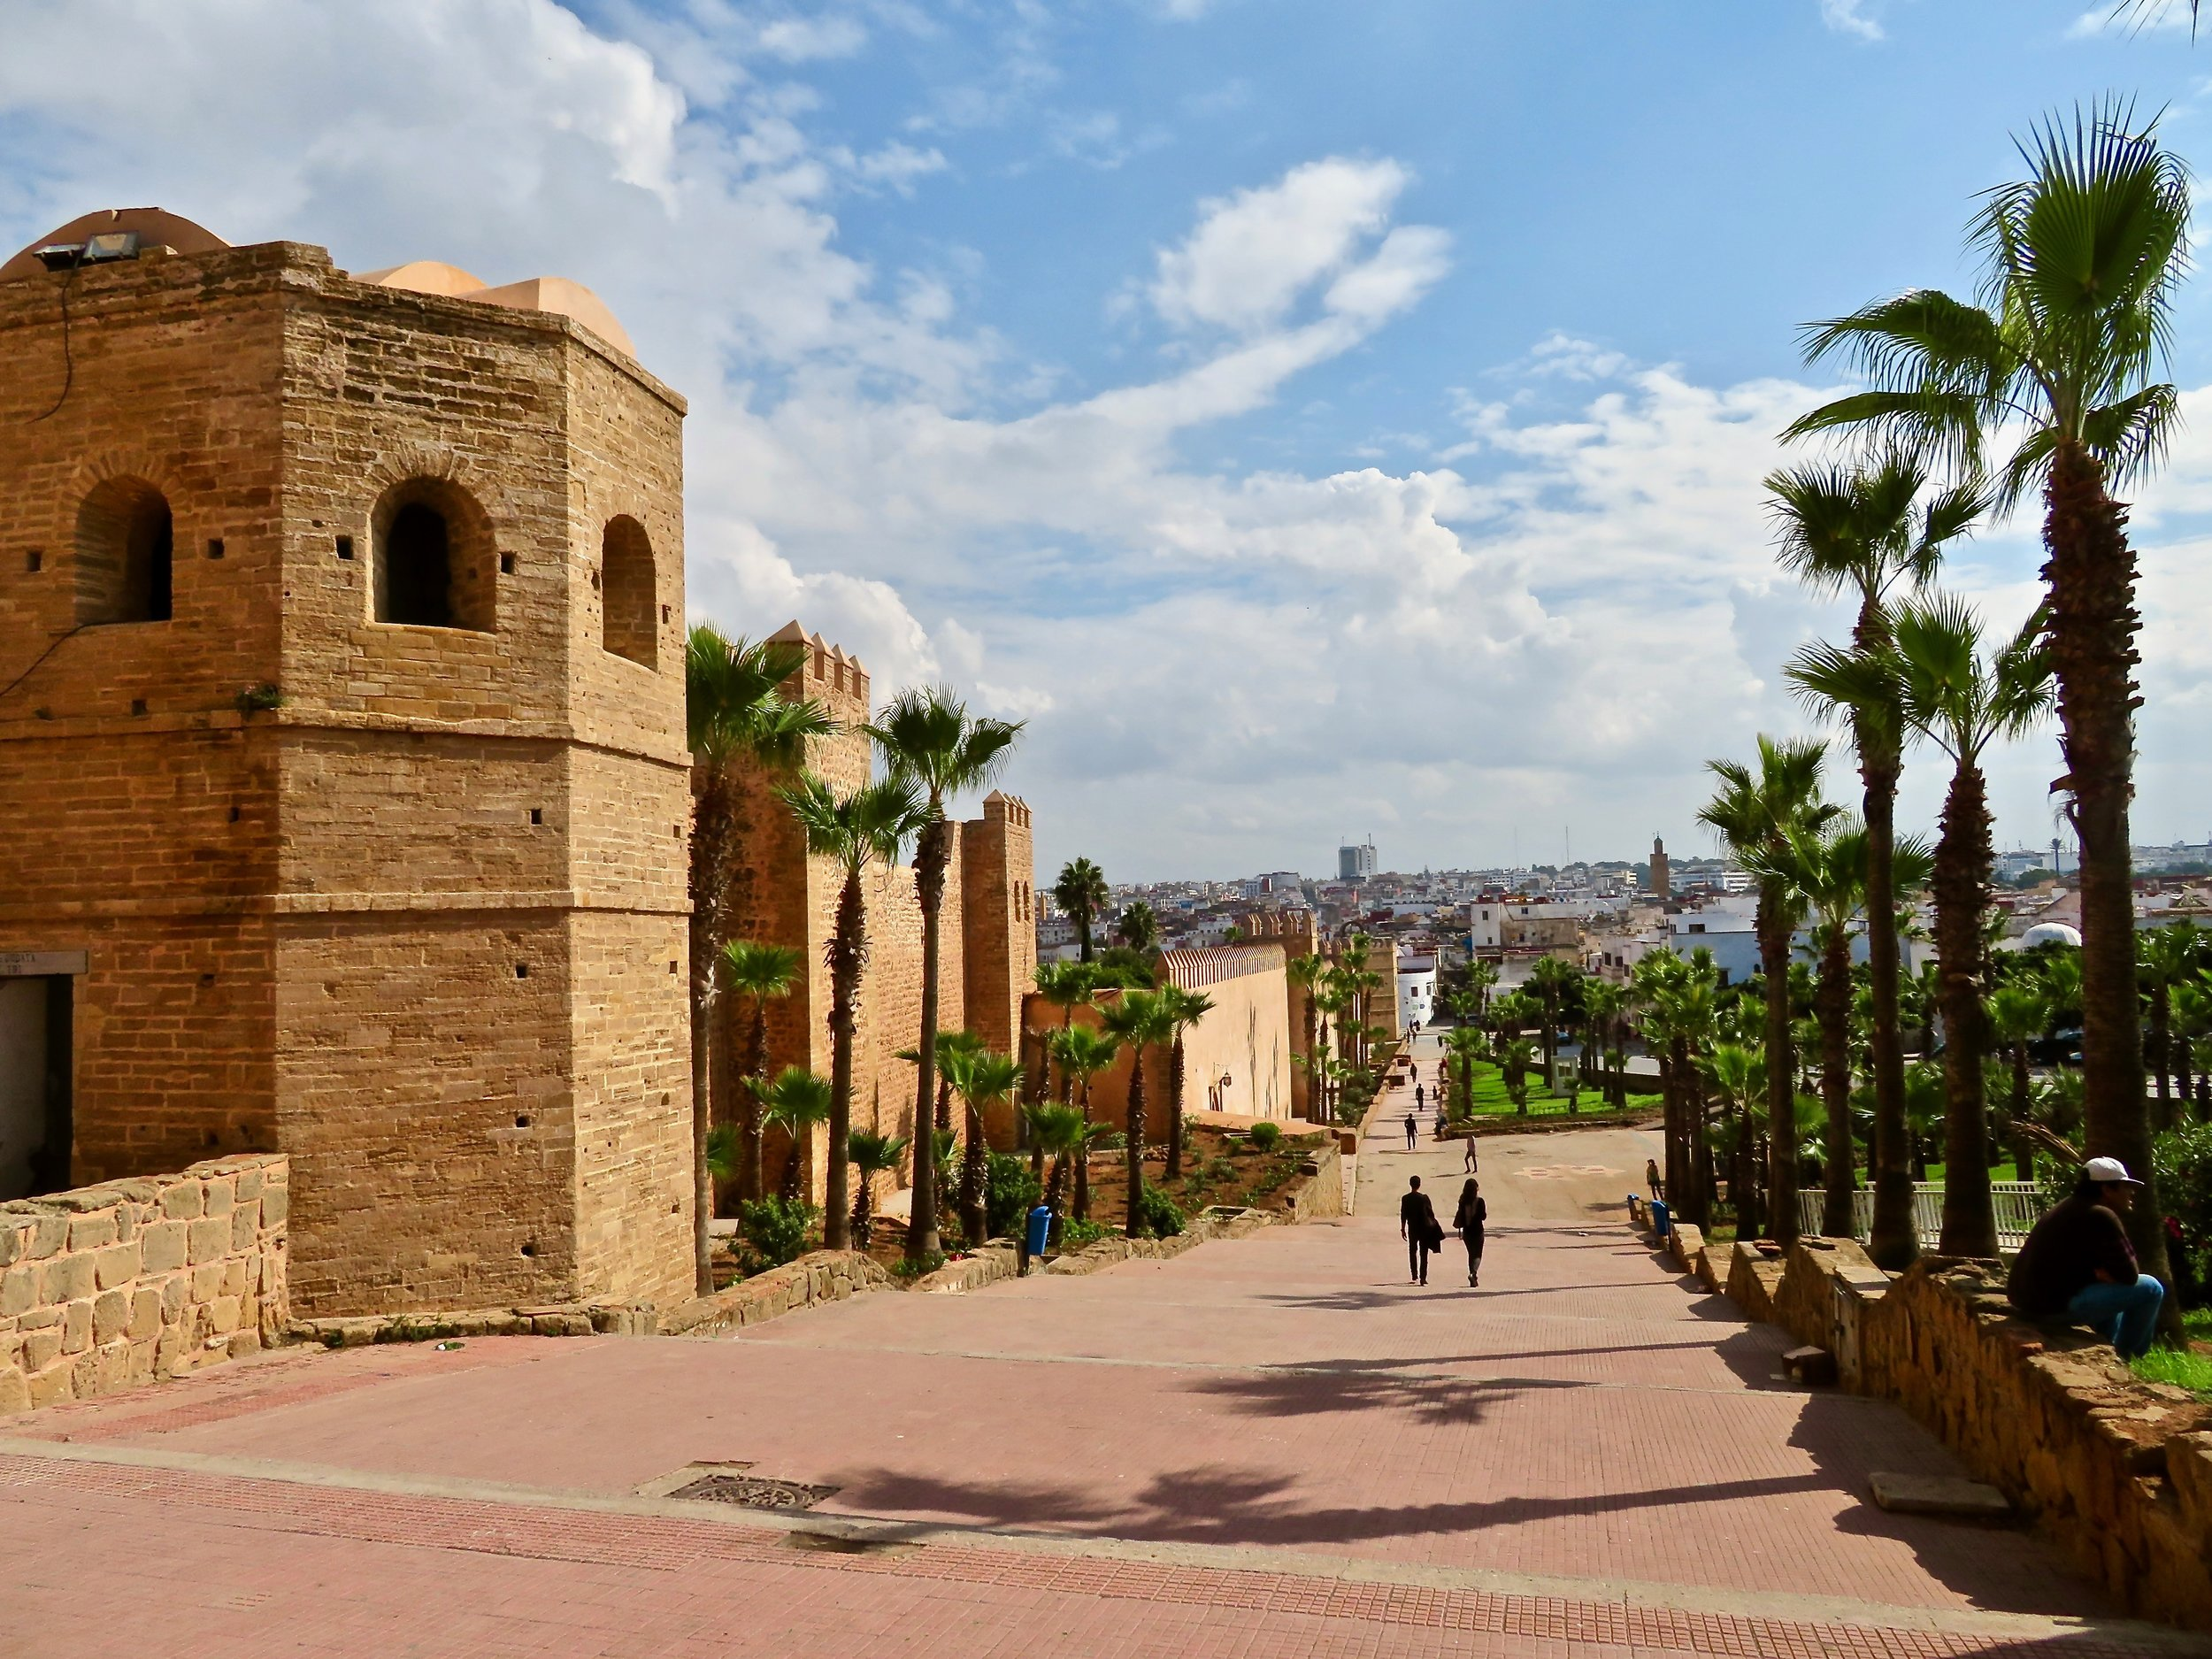 The walls of the kasbah, Meknès